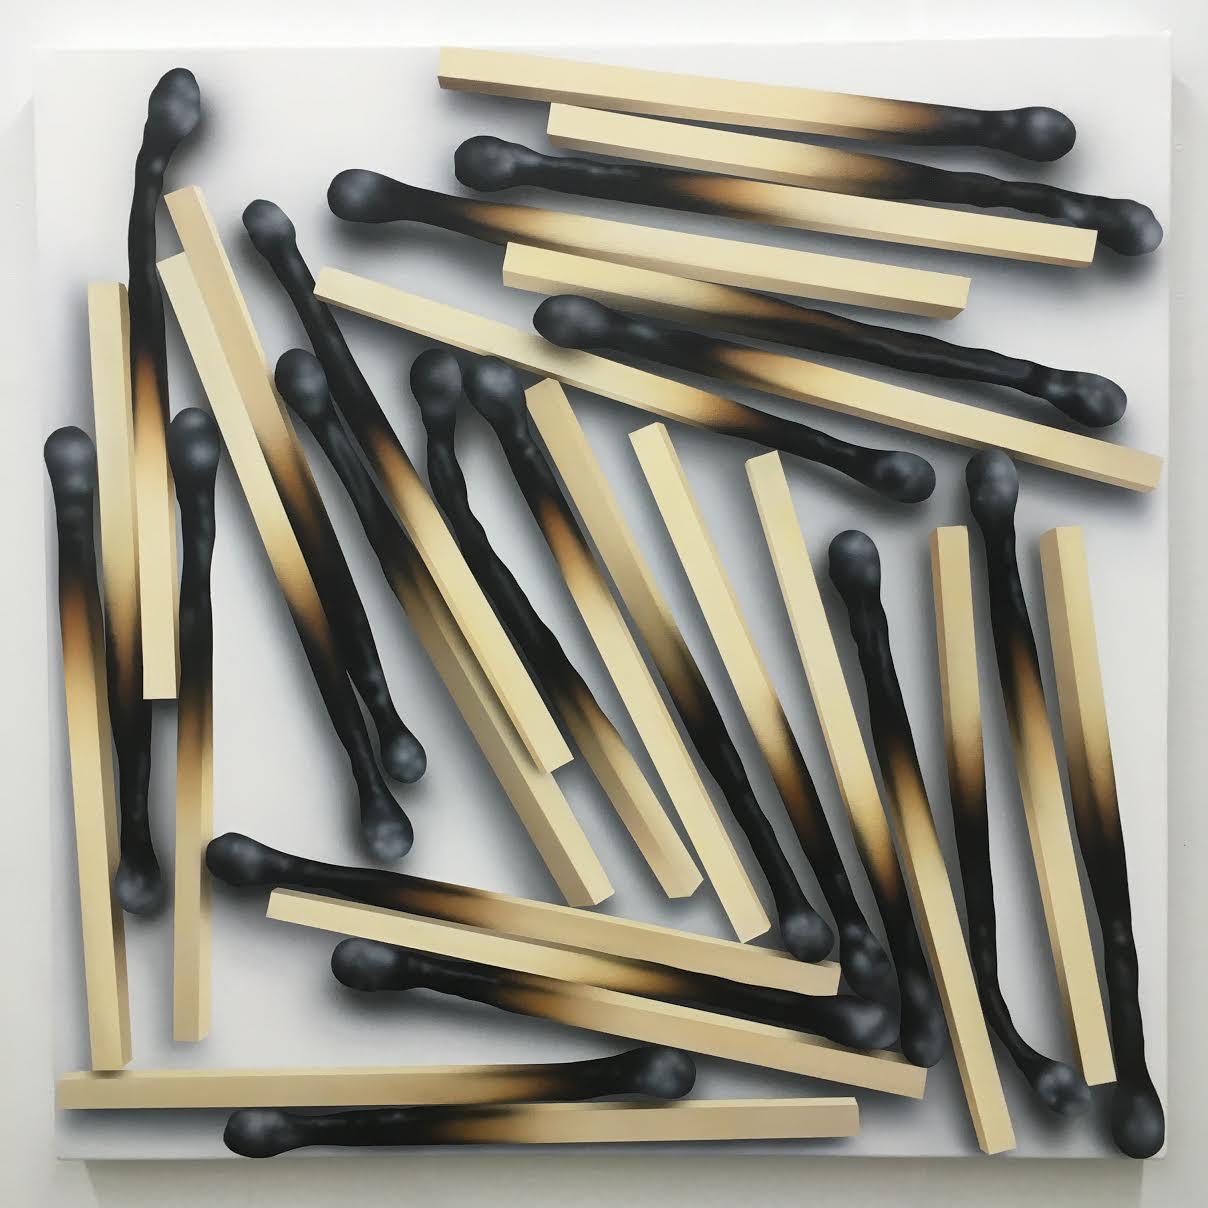 Rachel Hecker, Match arrangement #2, 2016, acrylic on canvas, 36 x3 6 inches